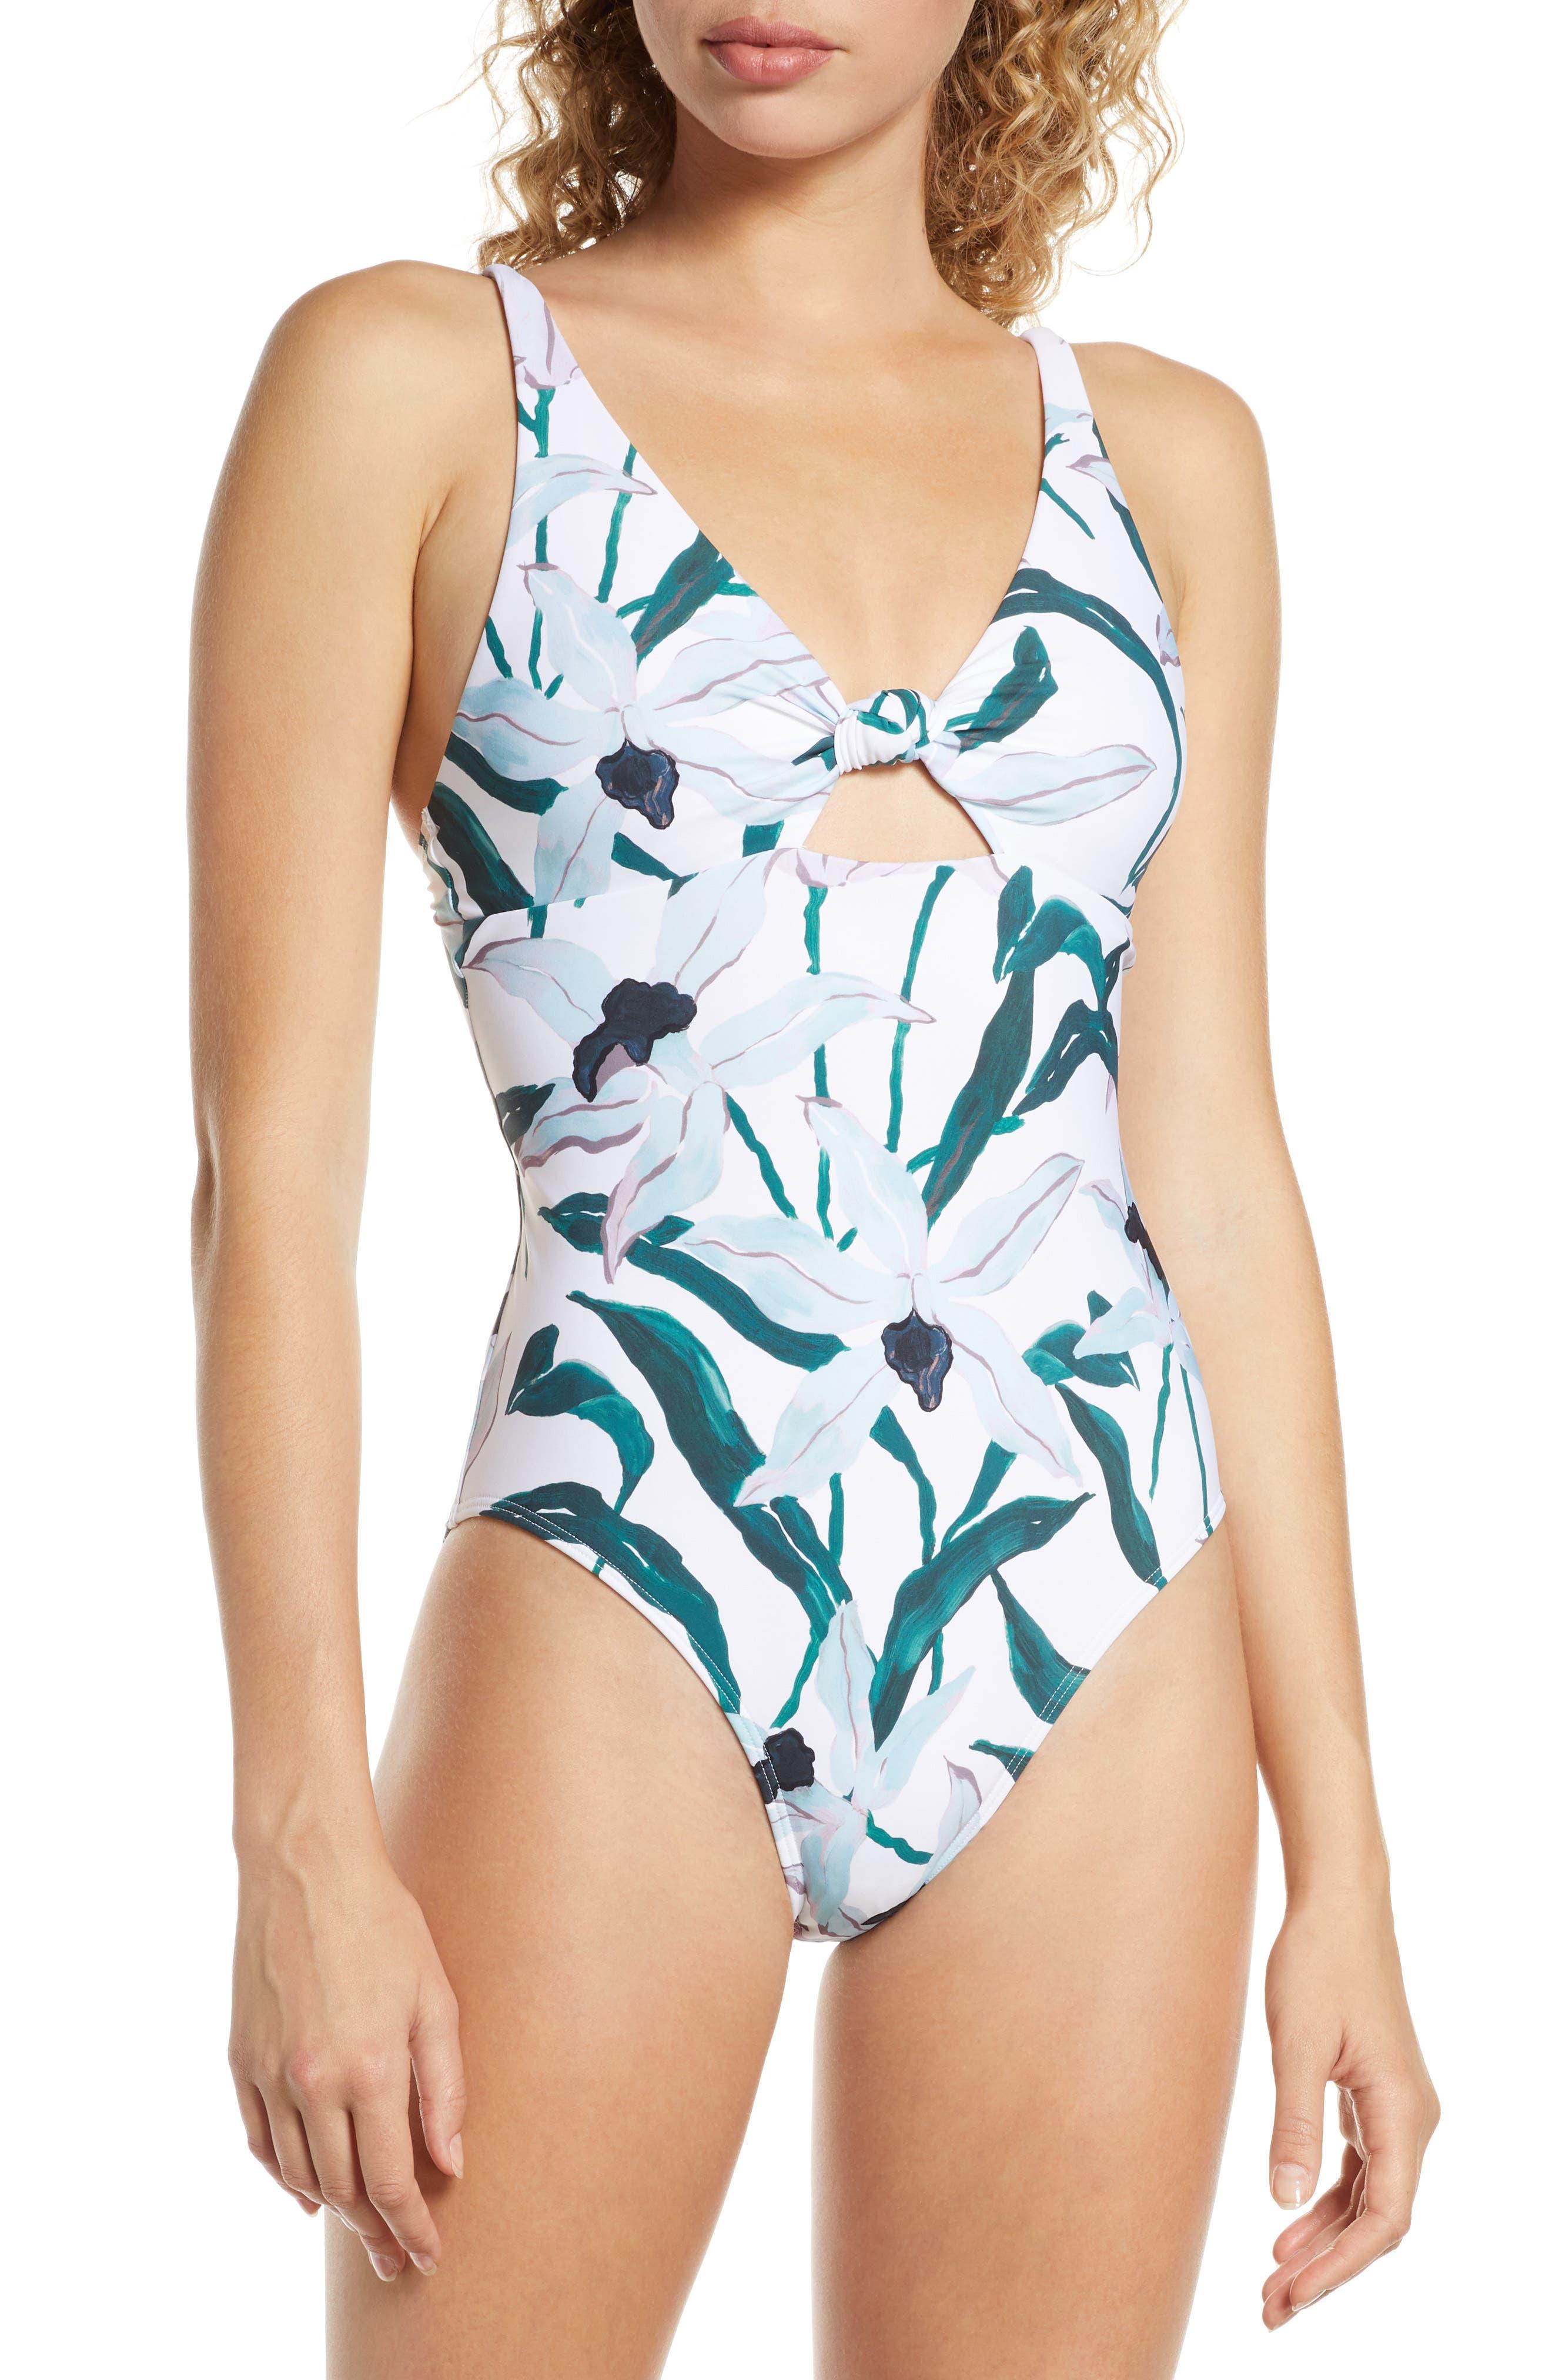 Tory Burch Palma Print One-Piece Swimsuit, White